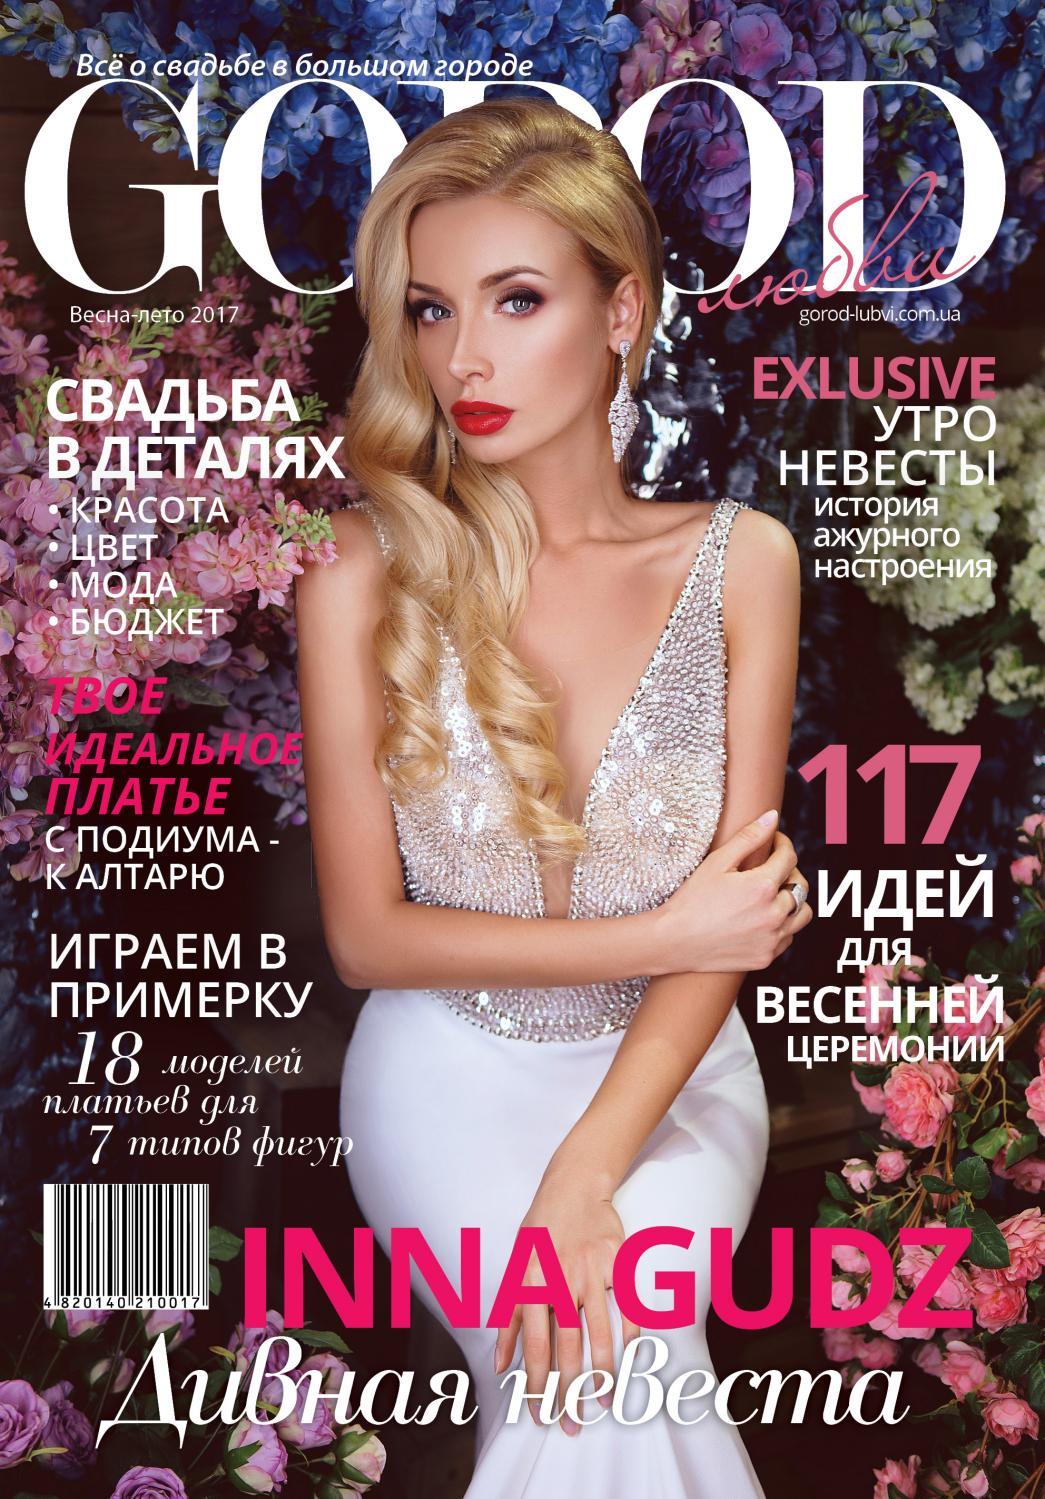 aad0747af09 Gorod любви весна-лето 2017 by Gorod Lubvi - issuu